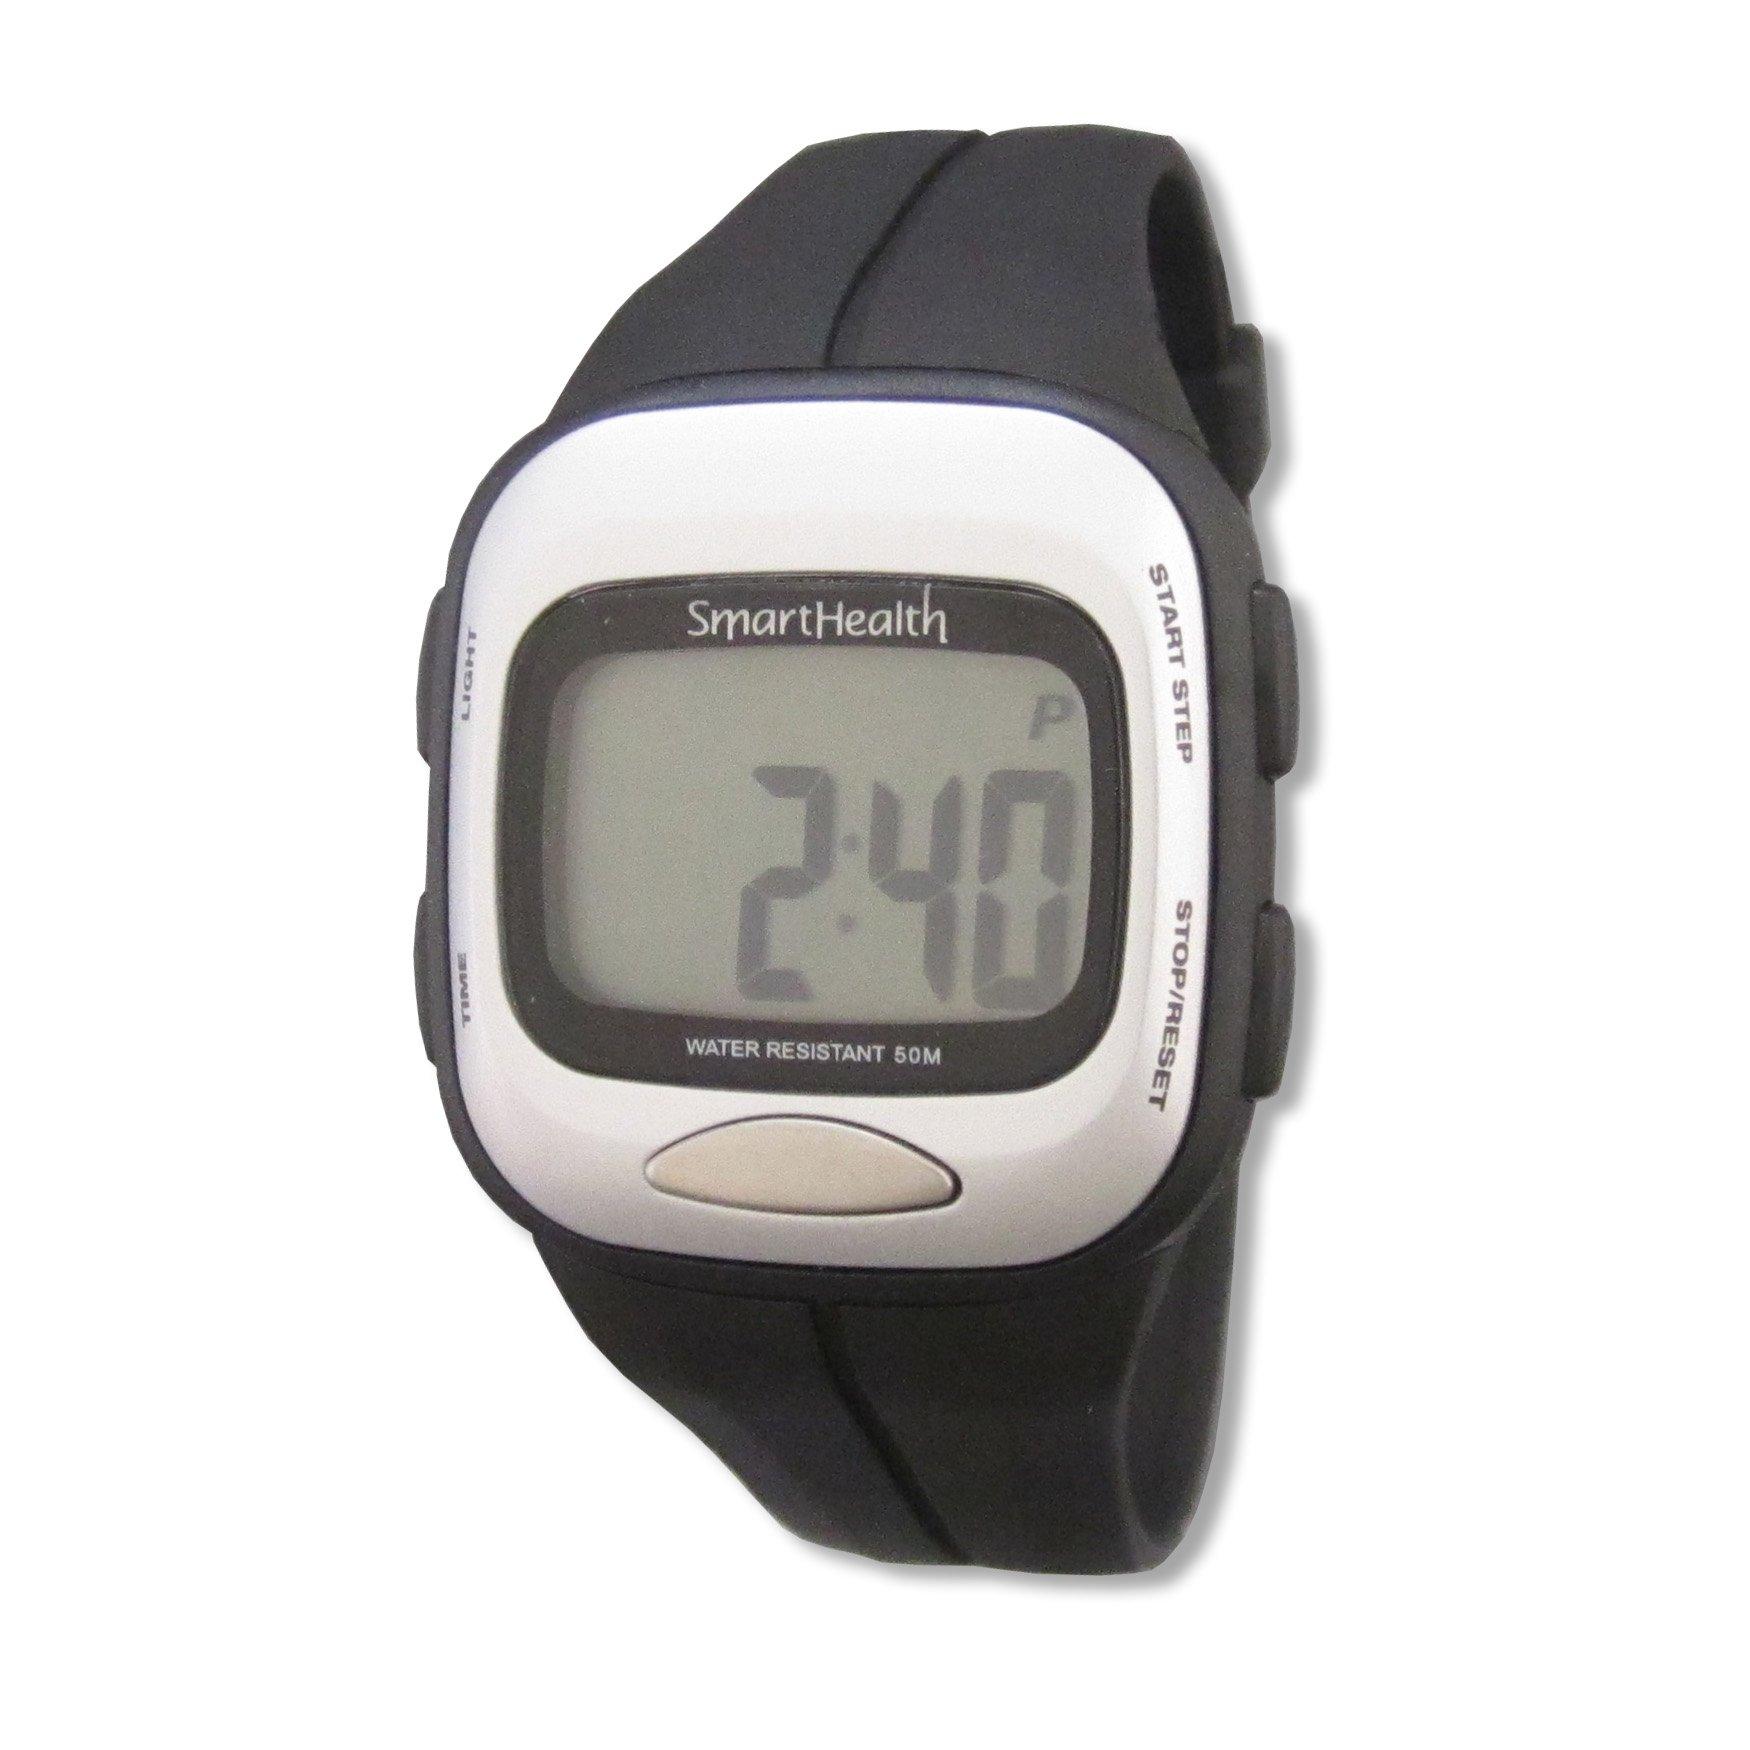 Smart Health Digital Pedometer Heart Rate Watch (Black) by Smarthealth